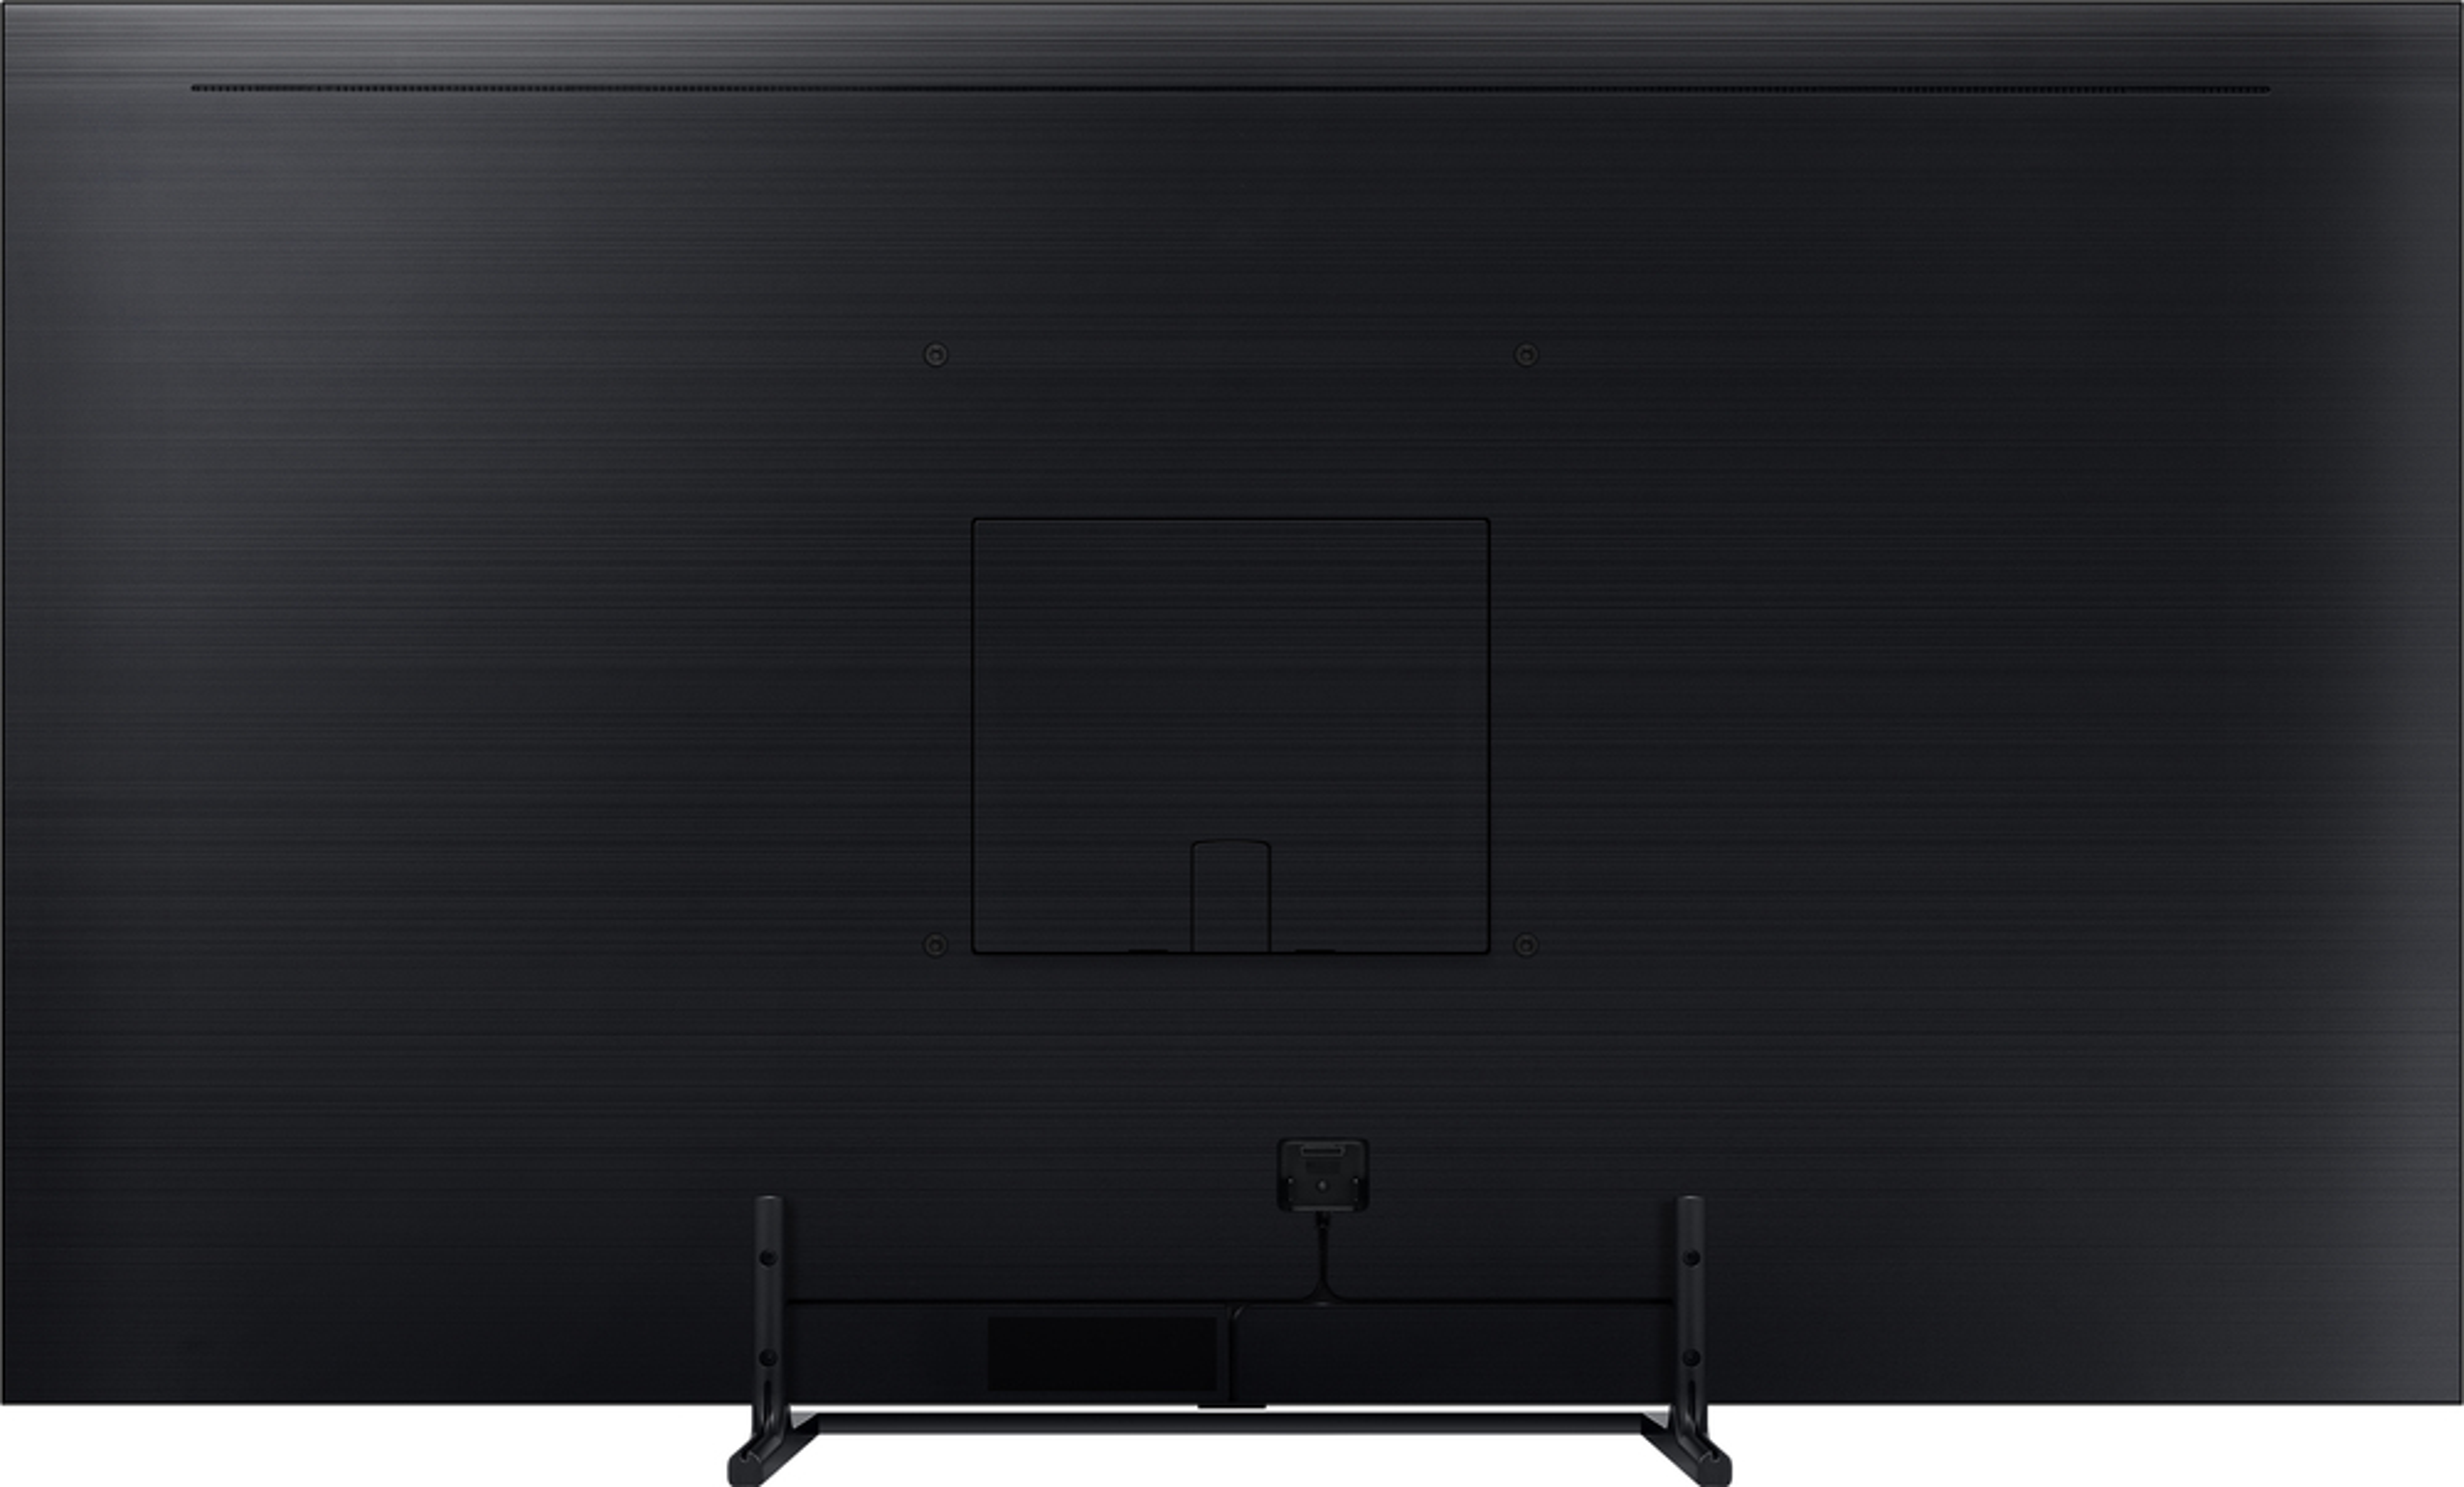 Image 5 for Samsung QN75Q9FNAFXZA